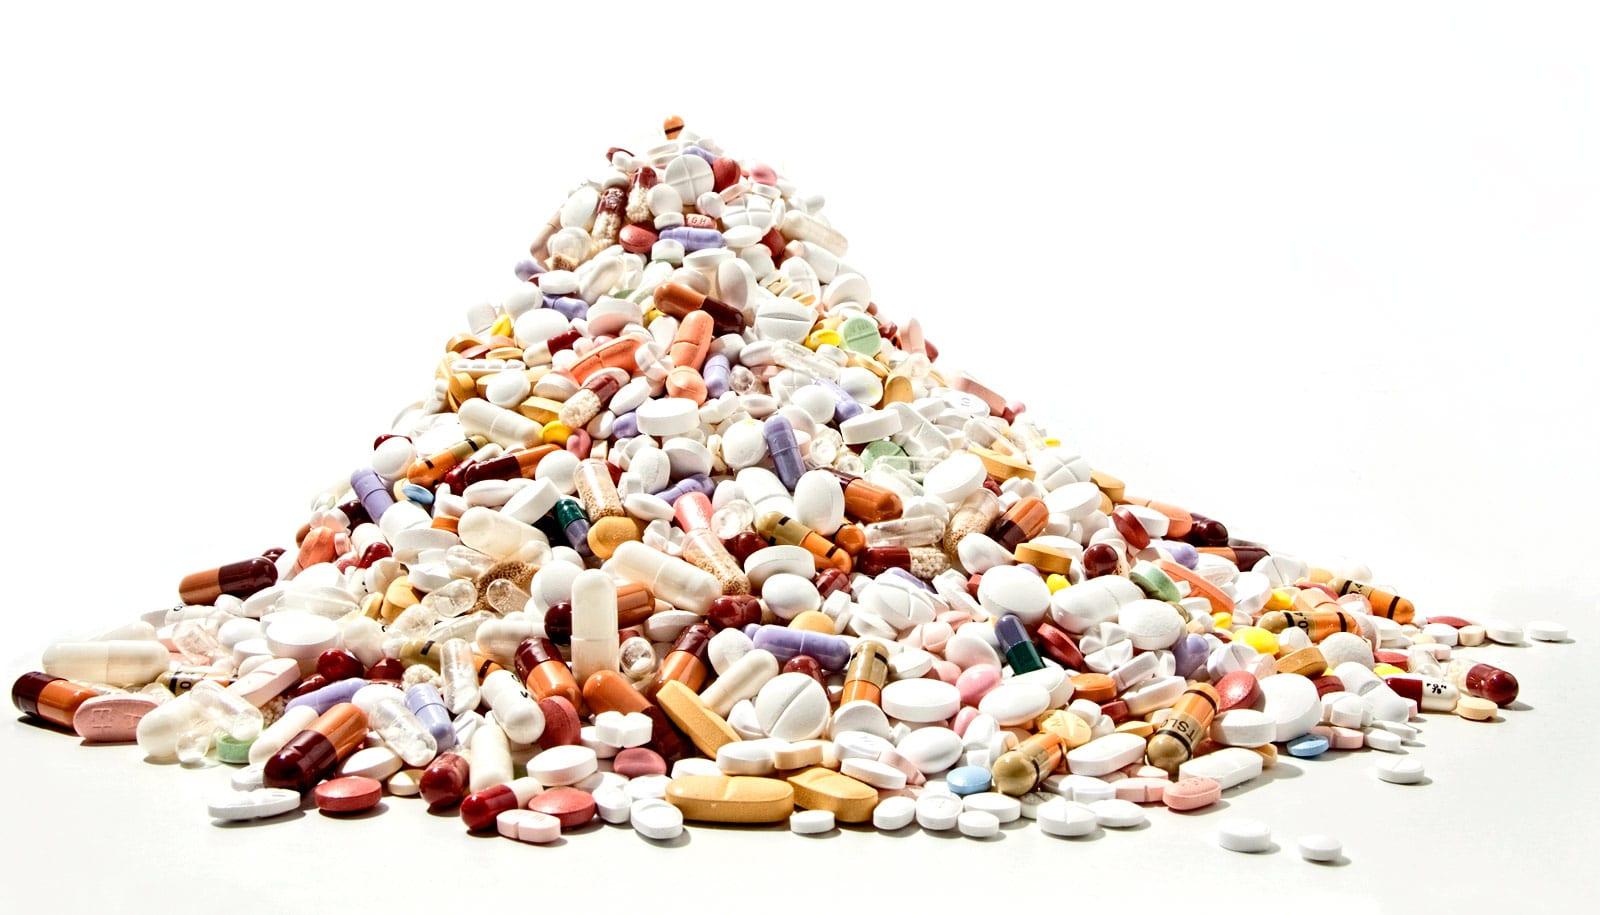 too many medicine ile ilgili görsel sonucu